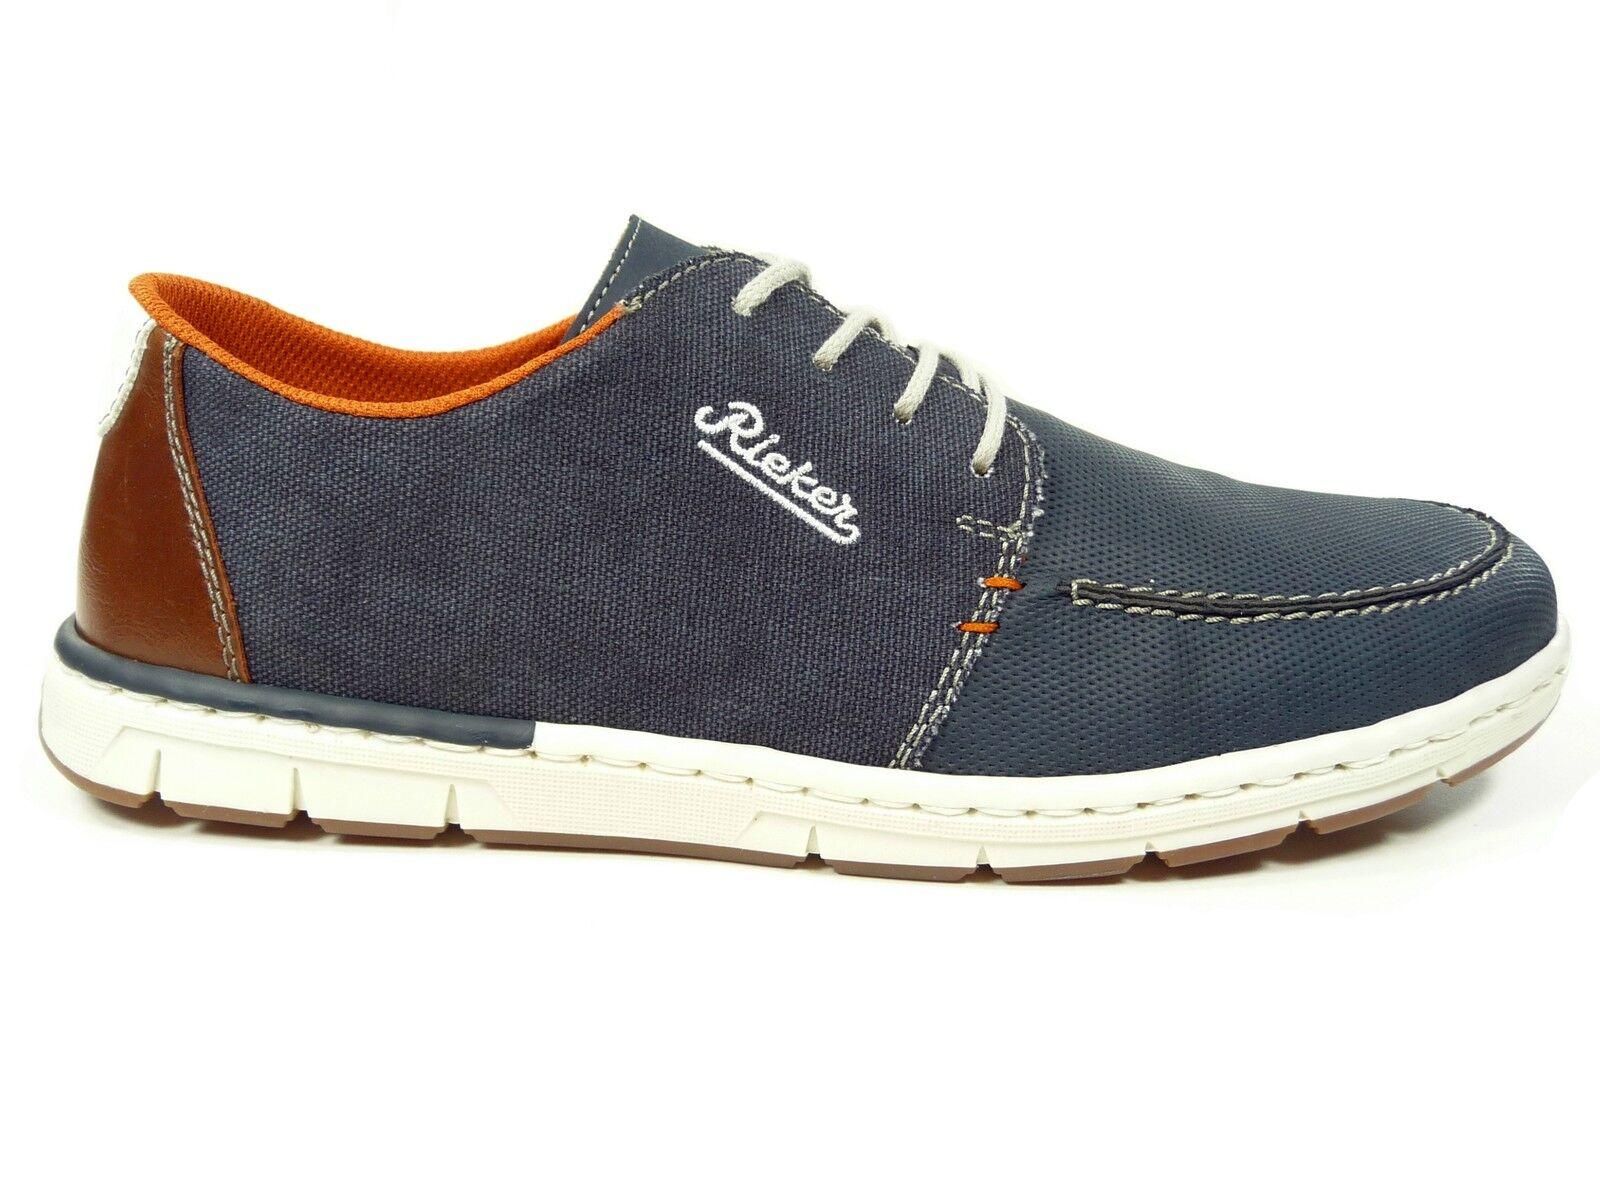 Rieker Herrenschuhe Halbschuhe Sneakers in Blau Weiss Orange 18935-14